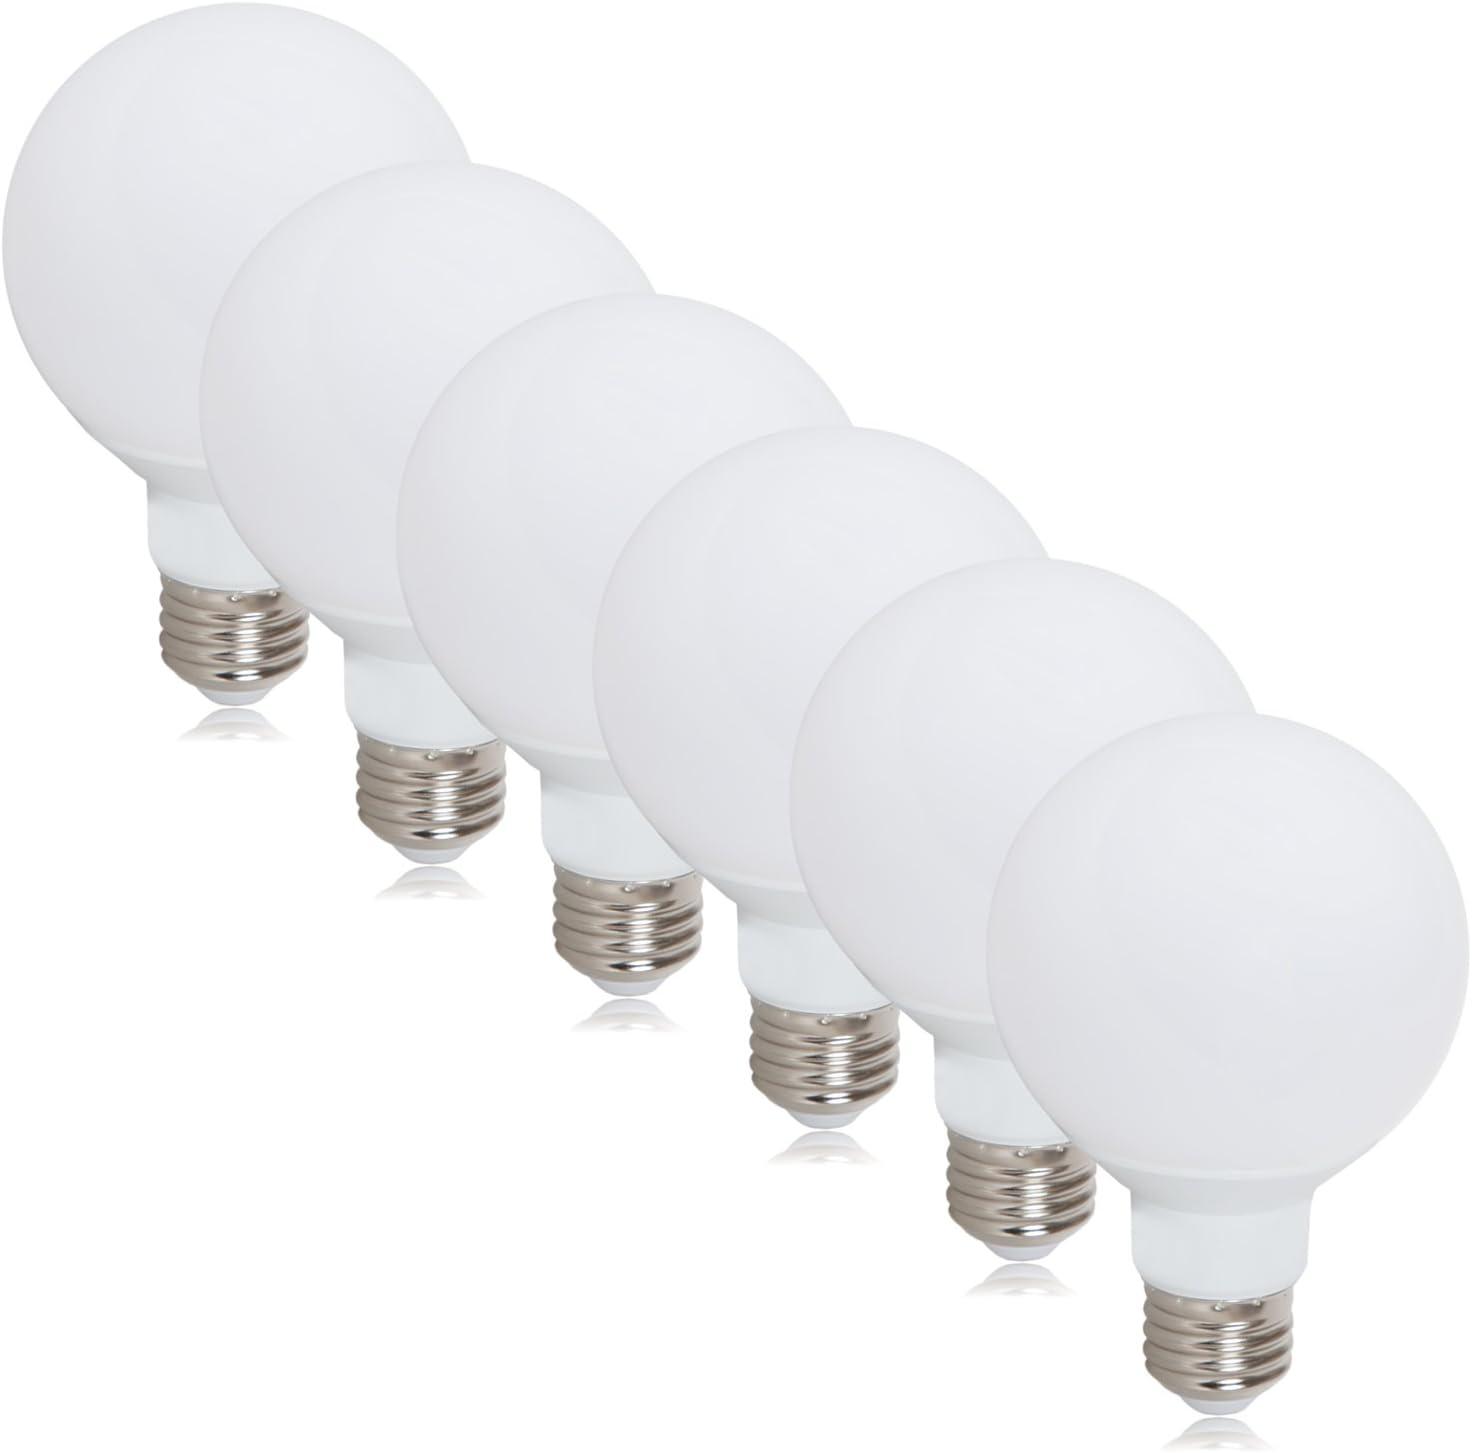 Maxxima G25 LED Light Bulb, 40 Watt Equivalent, 450 Lumens 4000K Neutral White Globe Light (6 Pack)